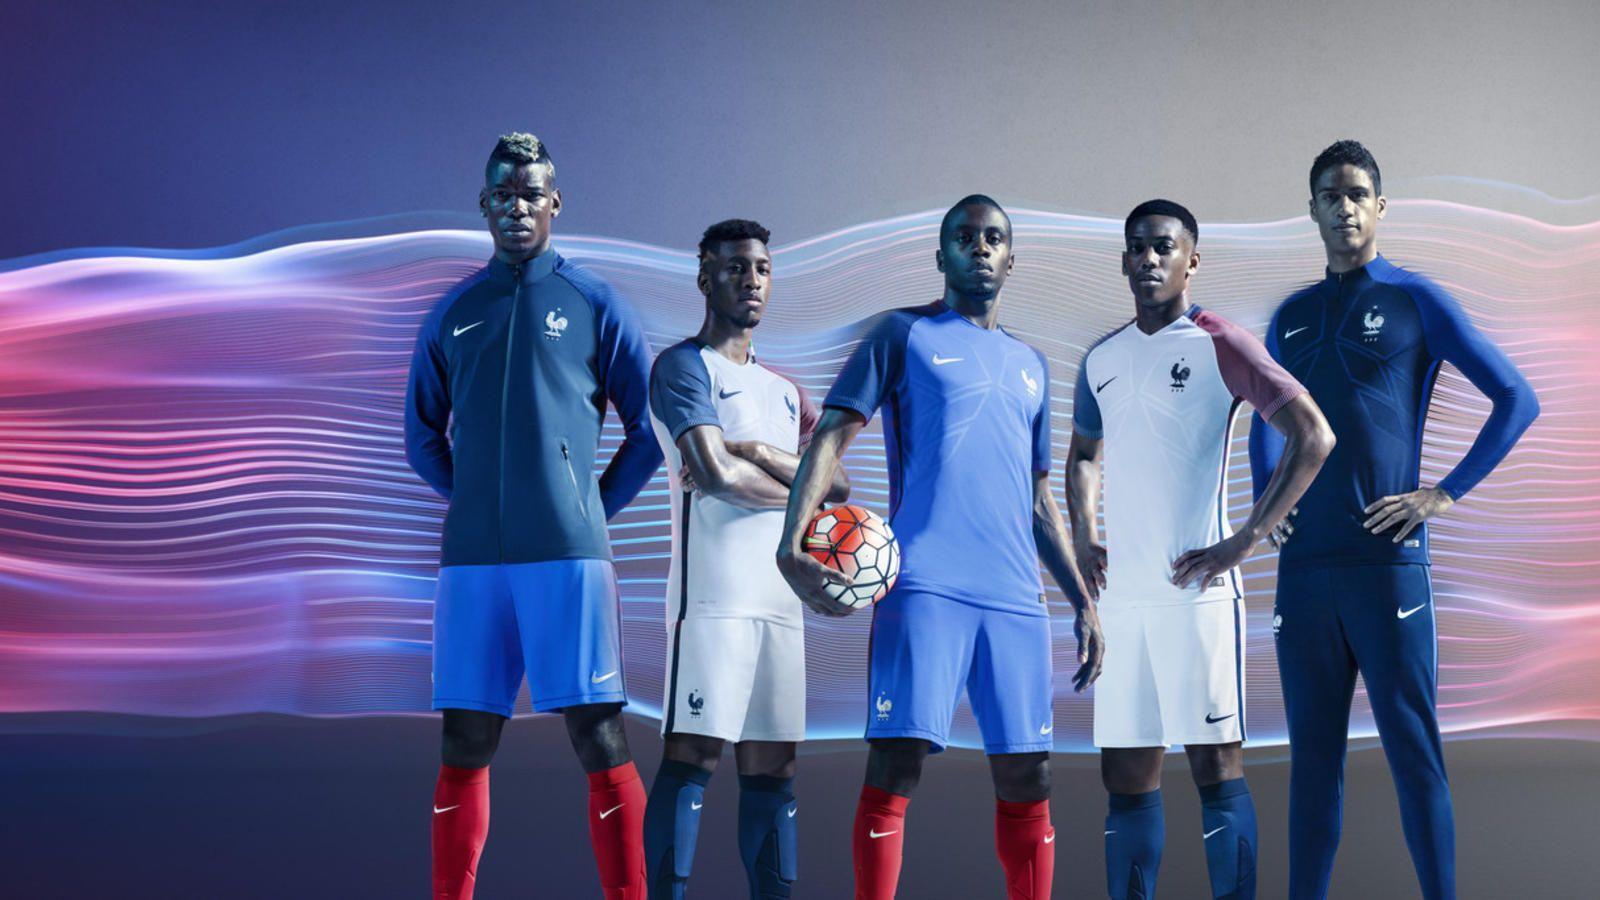 new arrivals 25b35 7c1c3 France National Football Team 2019 Wallpapers - Wallpaper Cave